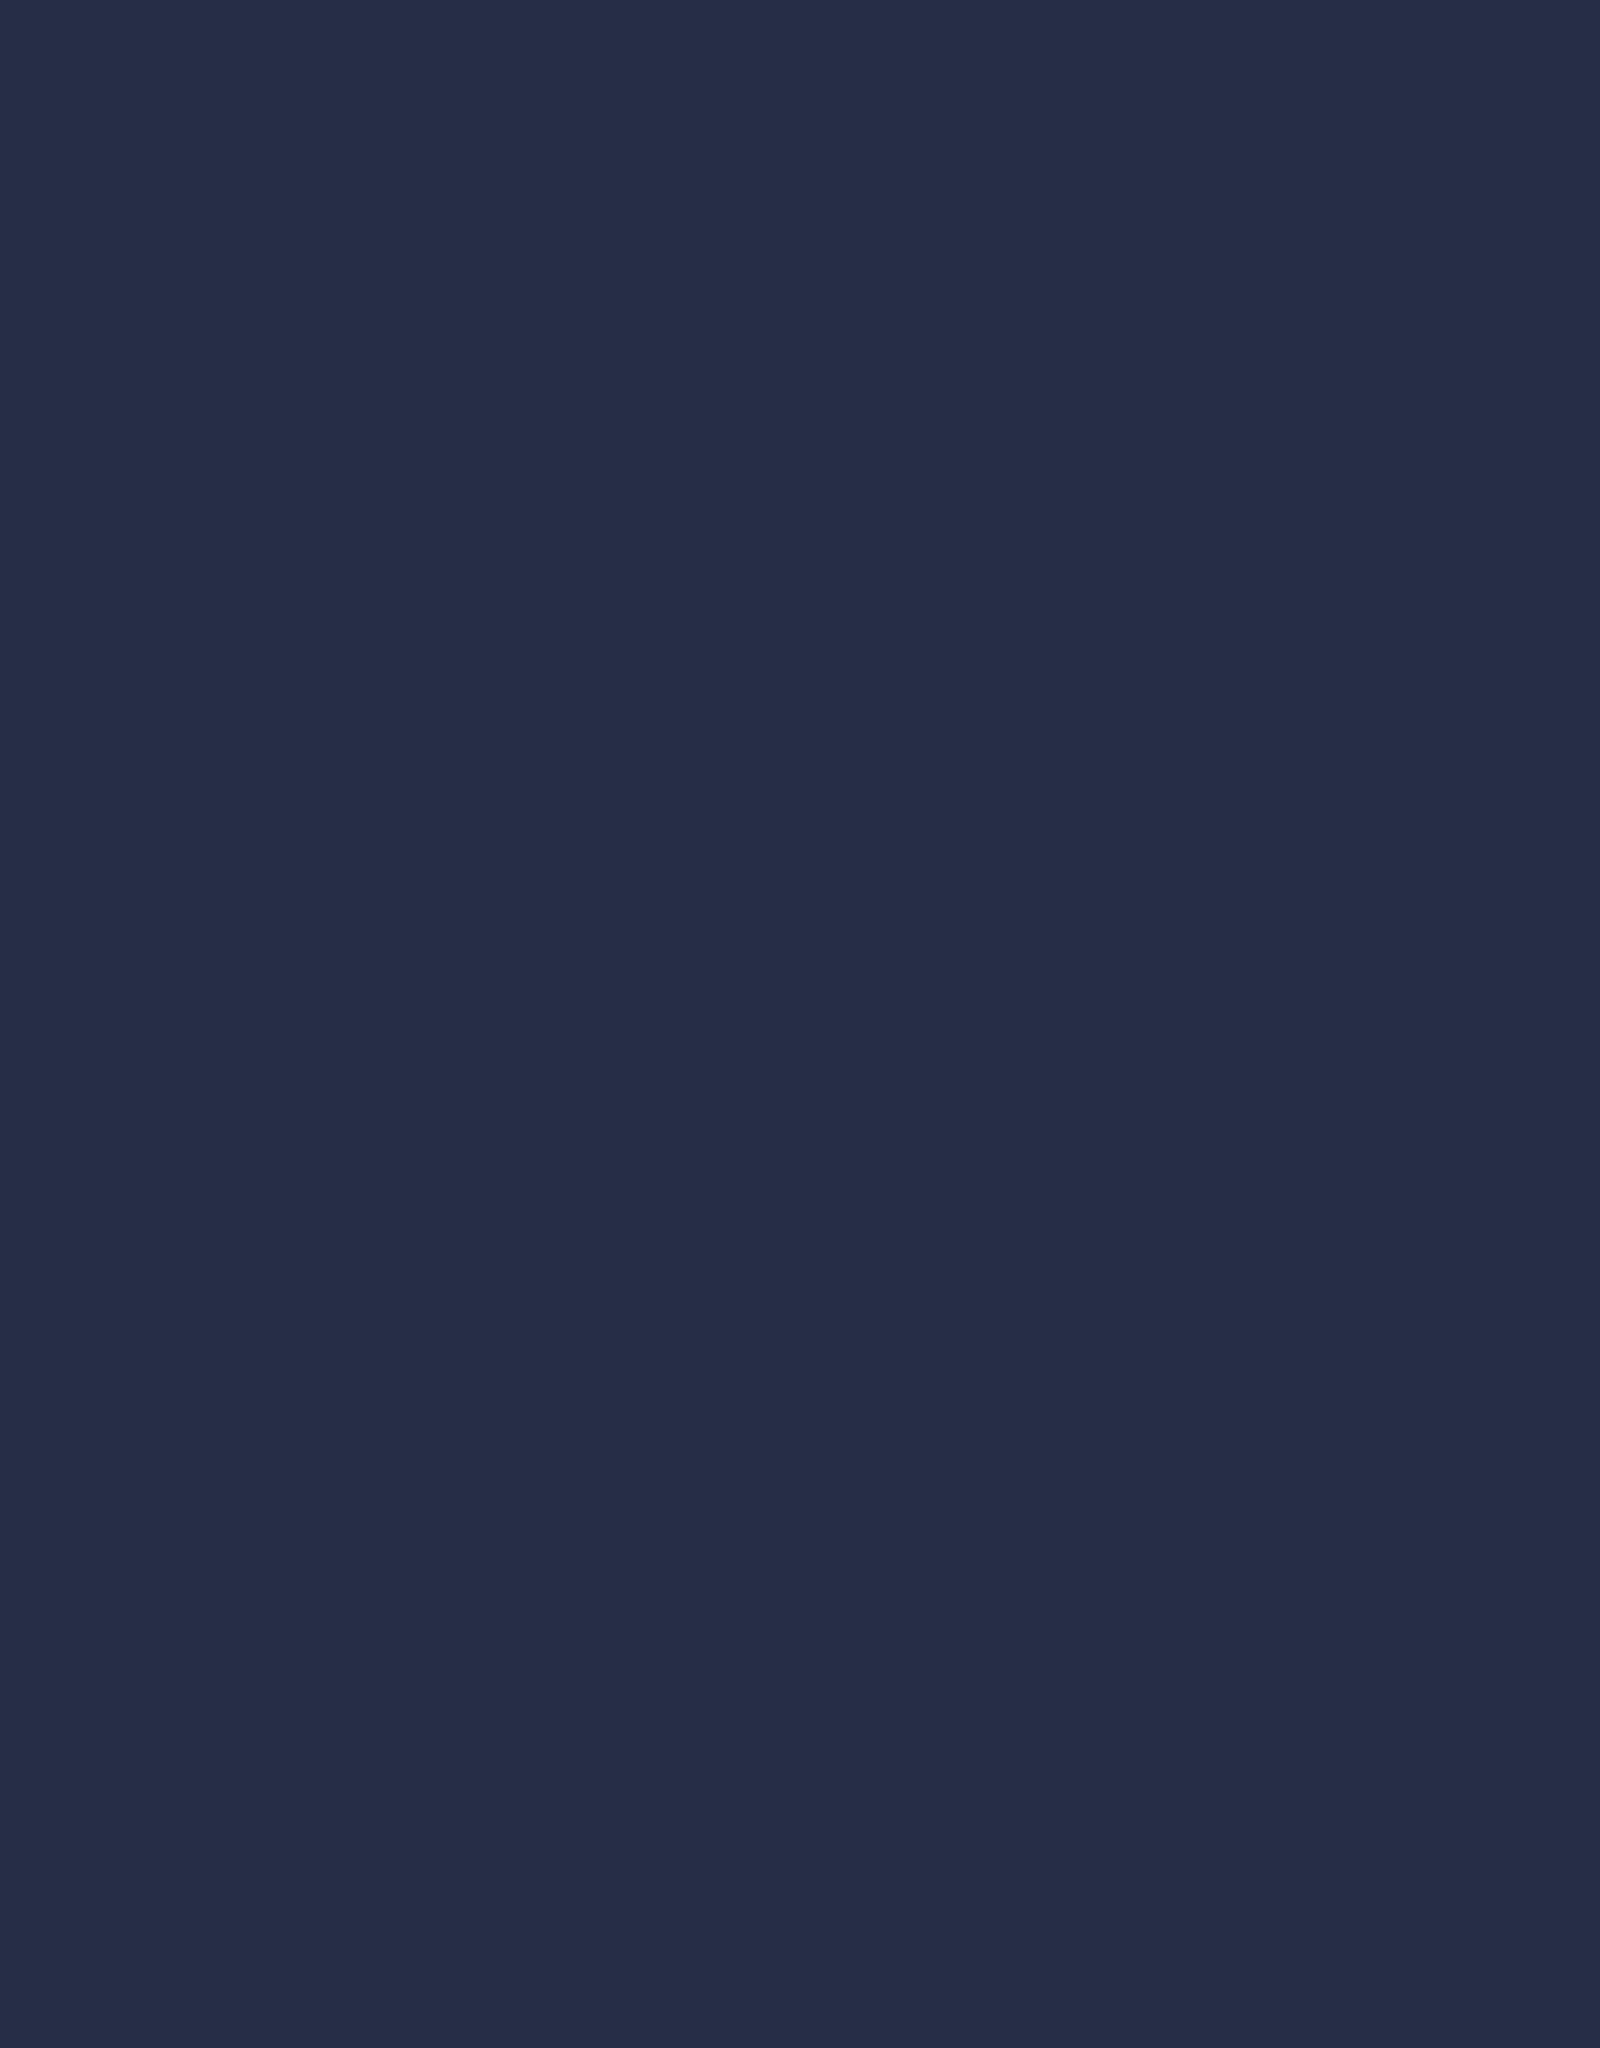 punta di roma donkerblauw 150 cm